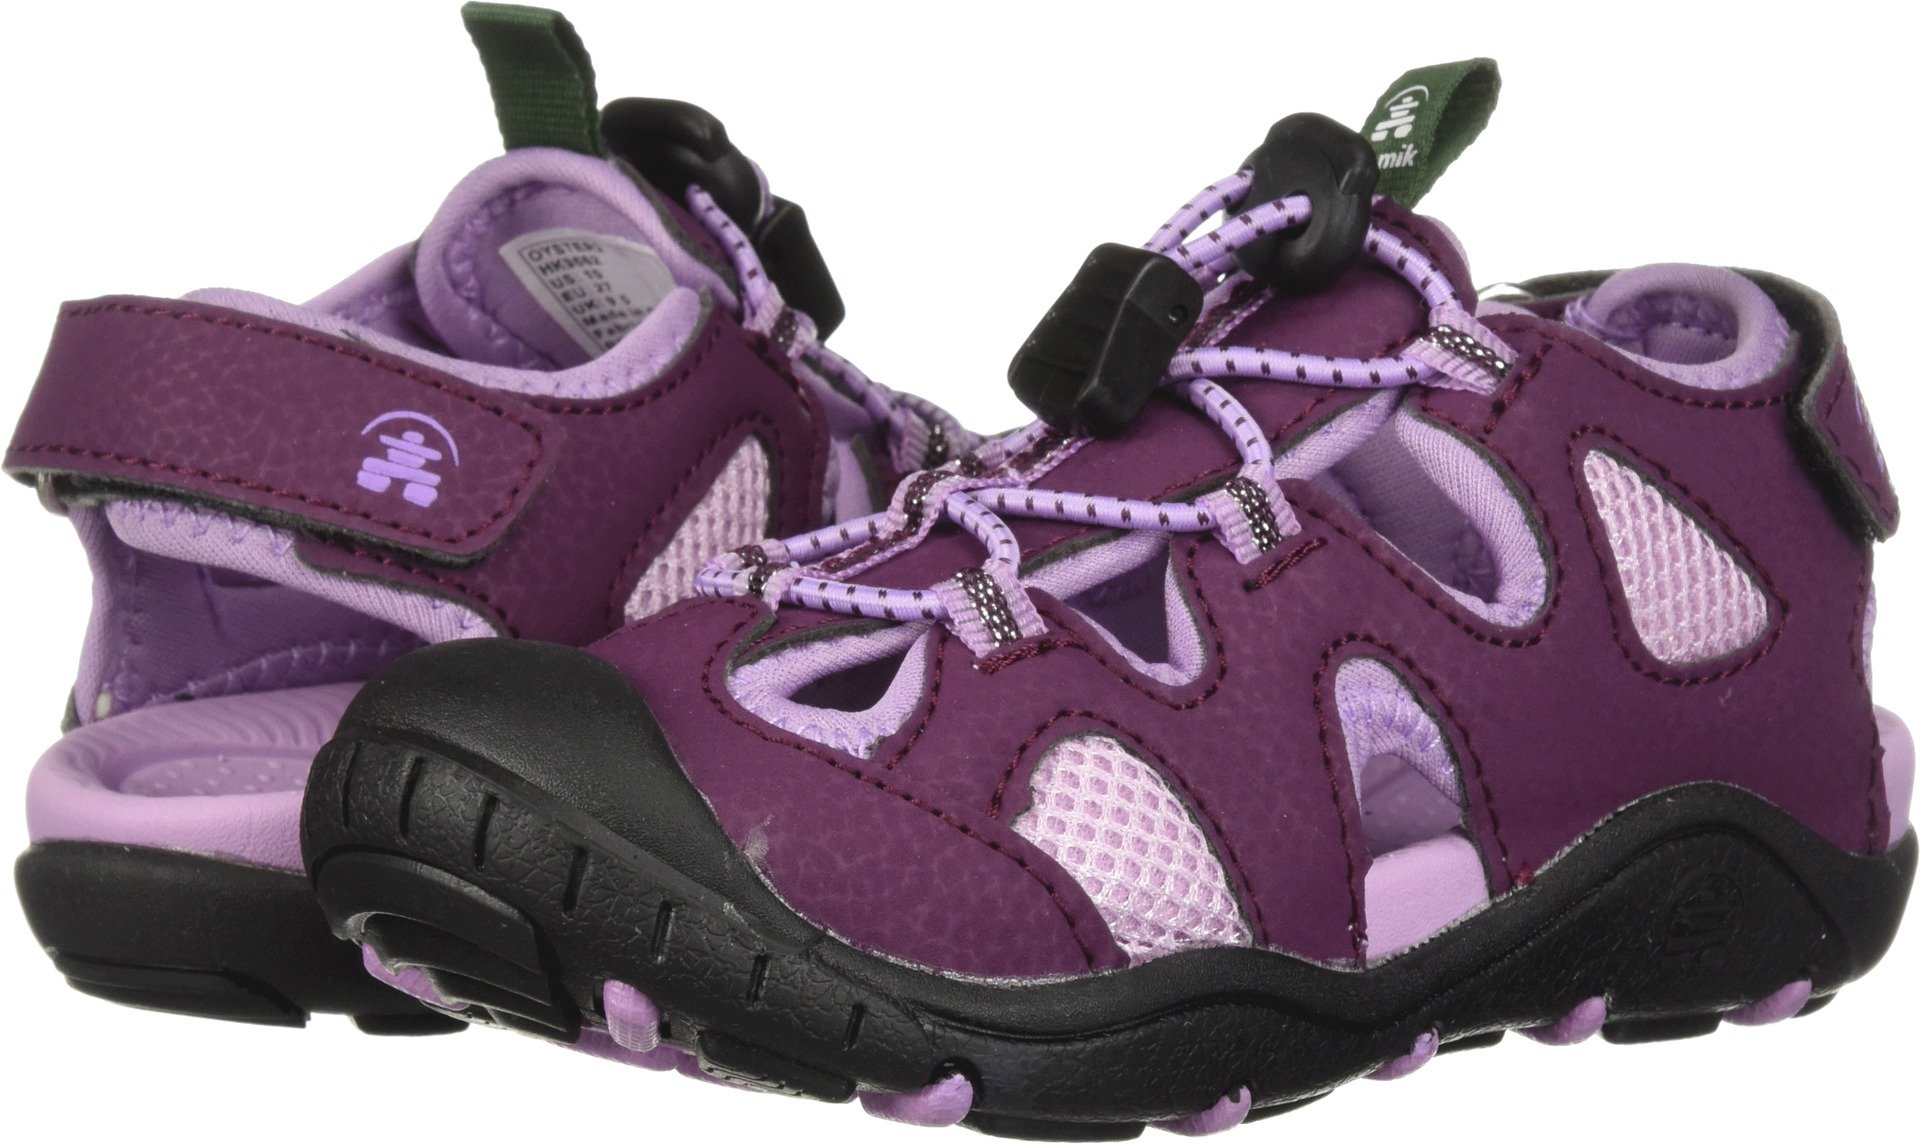 Kamik Girls' Oyster2, Dark Purple/Lilac, 3 M US Little Kid